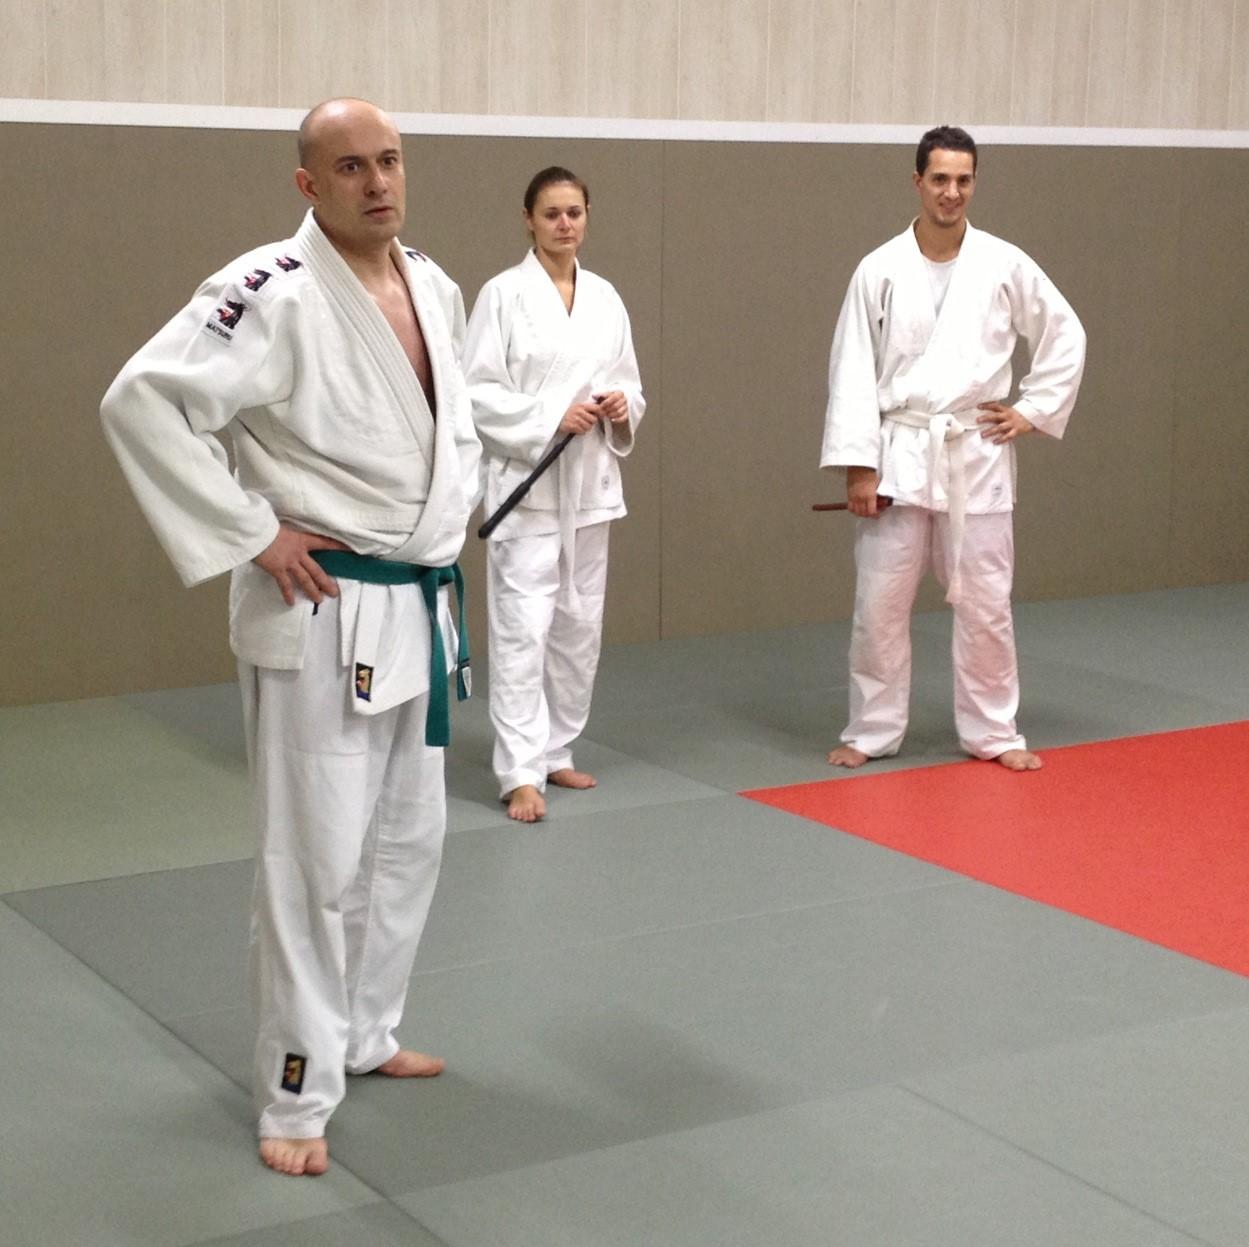 jujitsu-efjjsd-novembre-2013 5